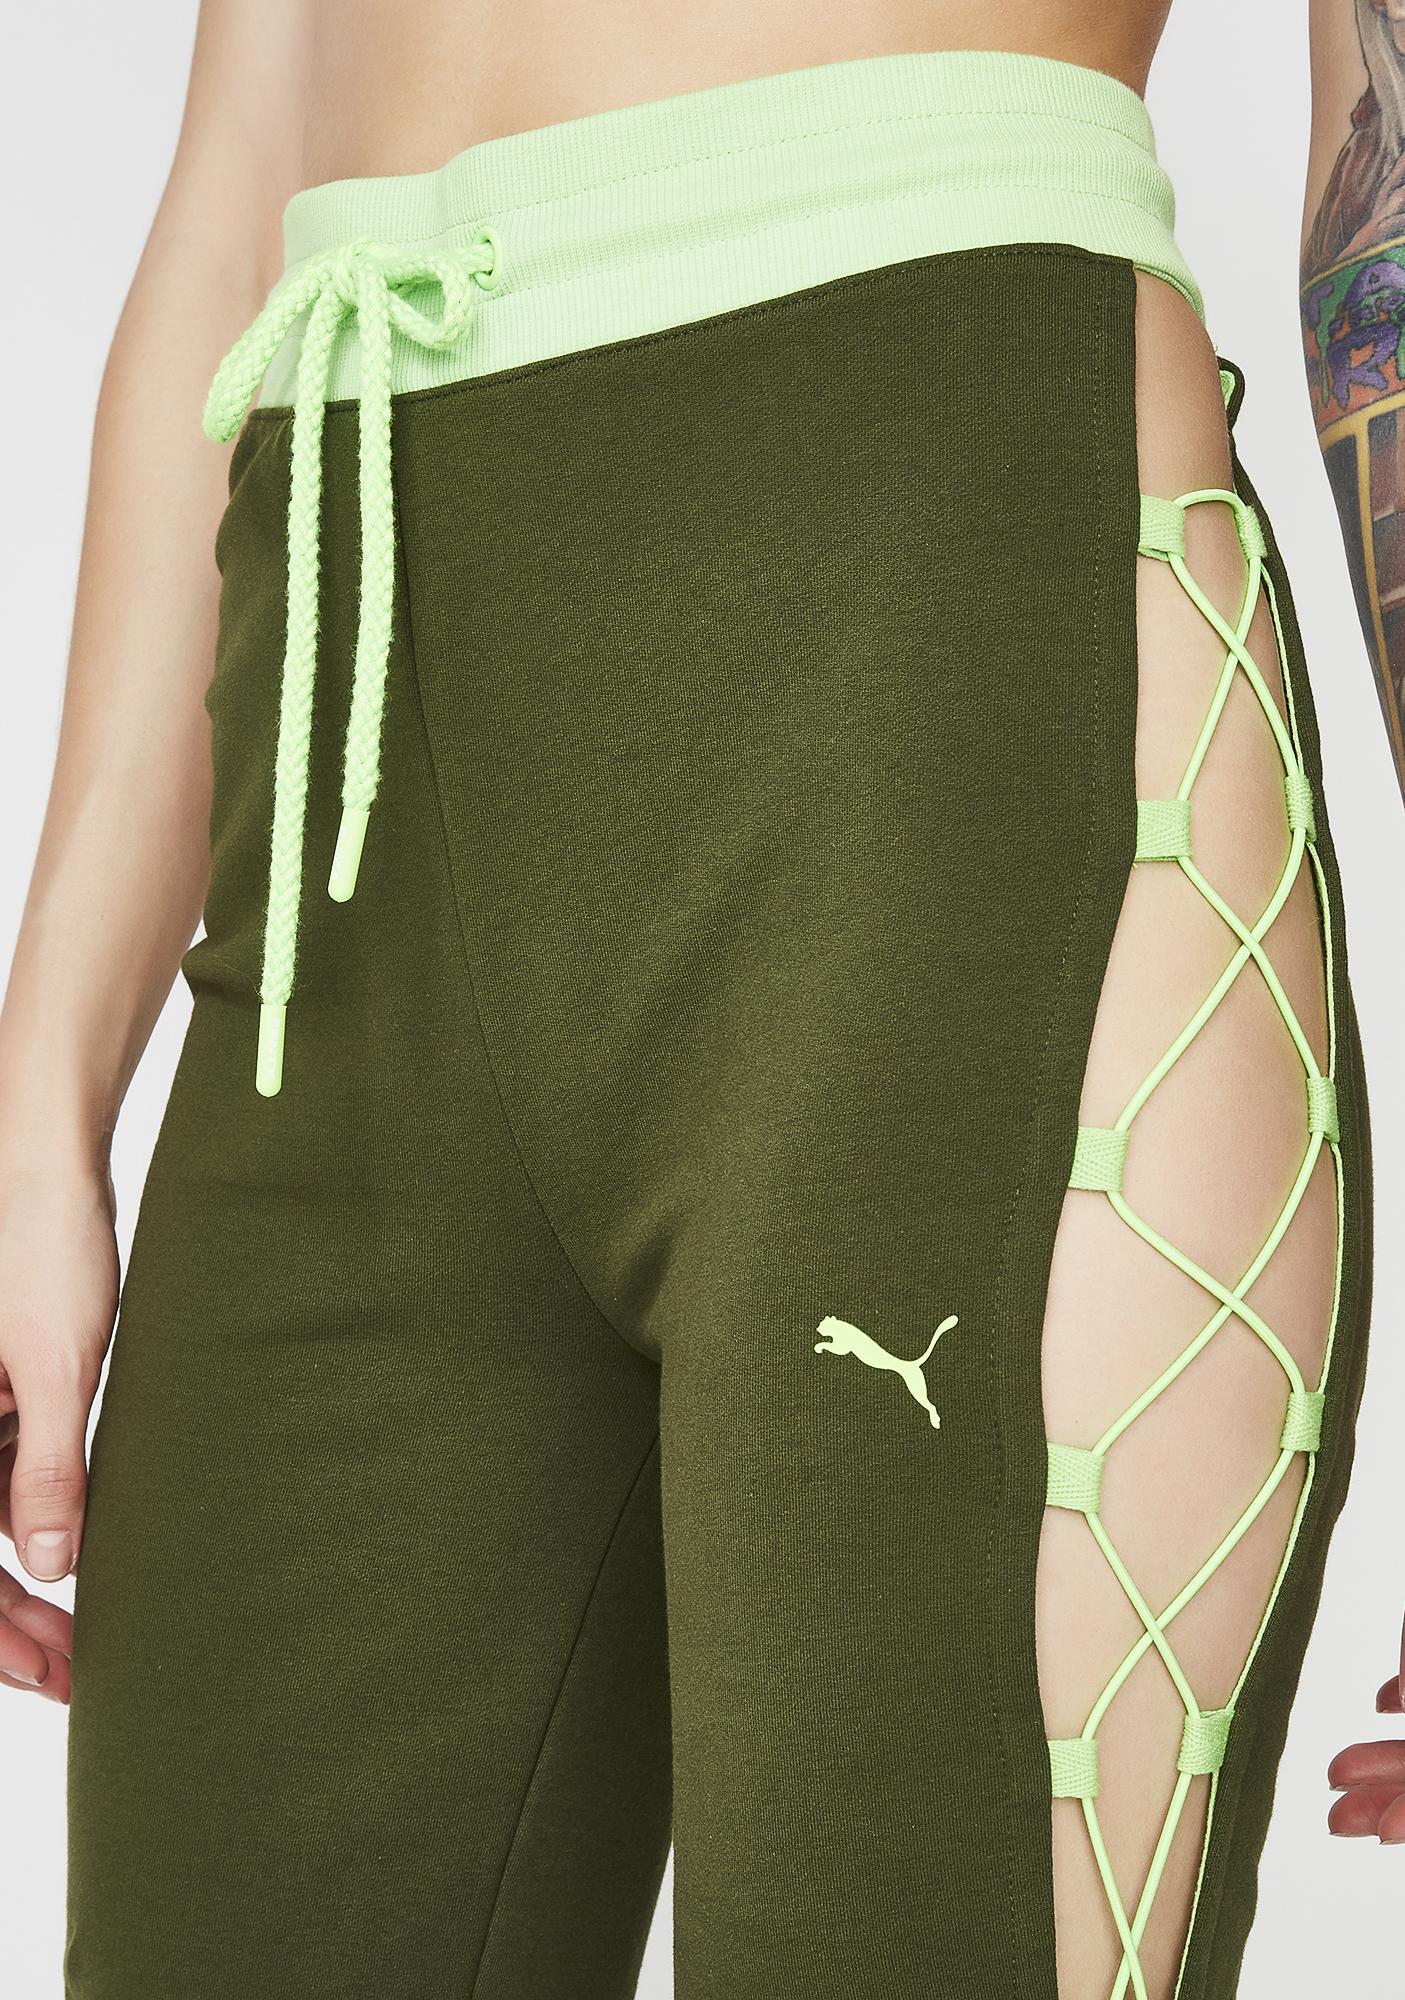 PUMA FENTY PUMA By Rihanna Laced Sweatpants